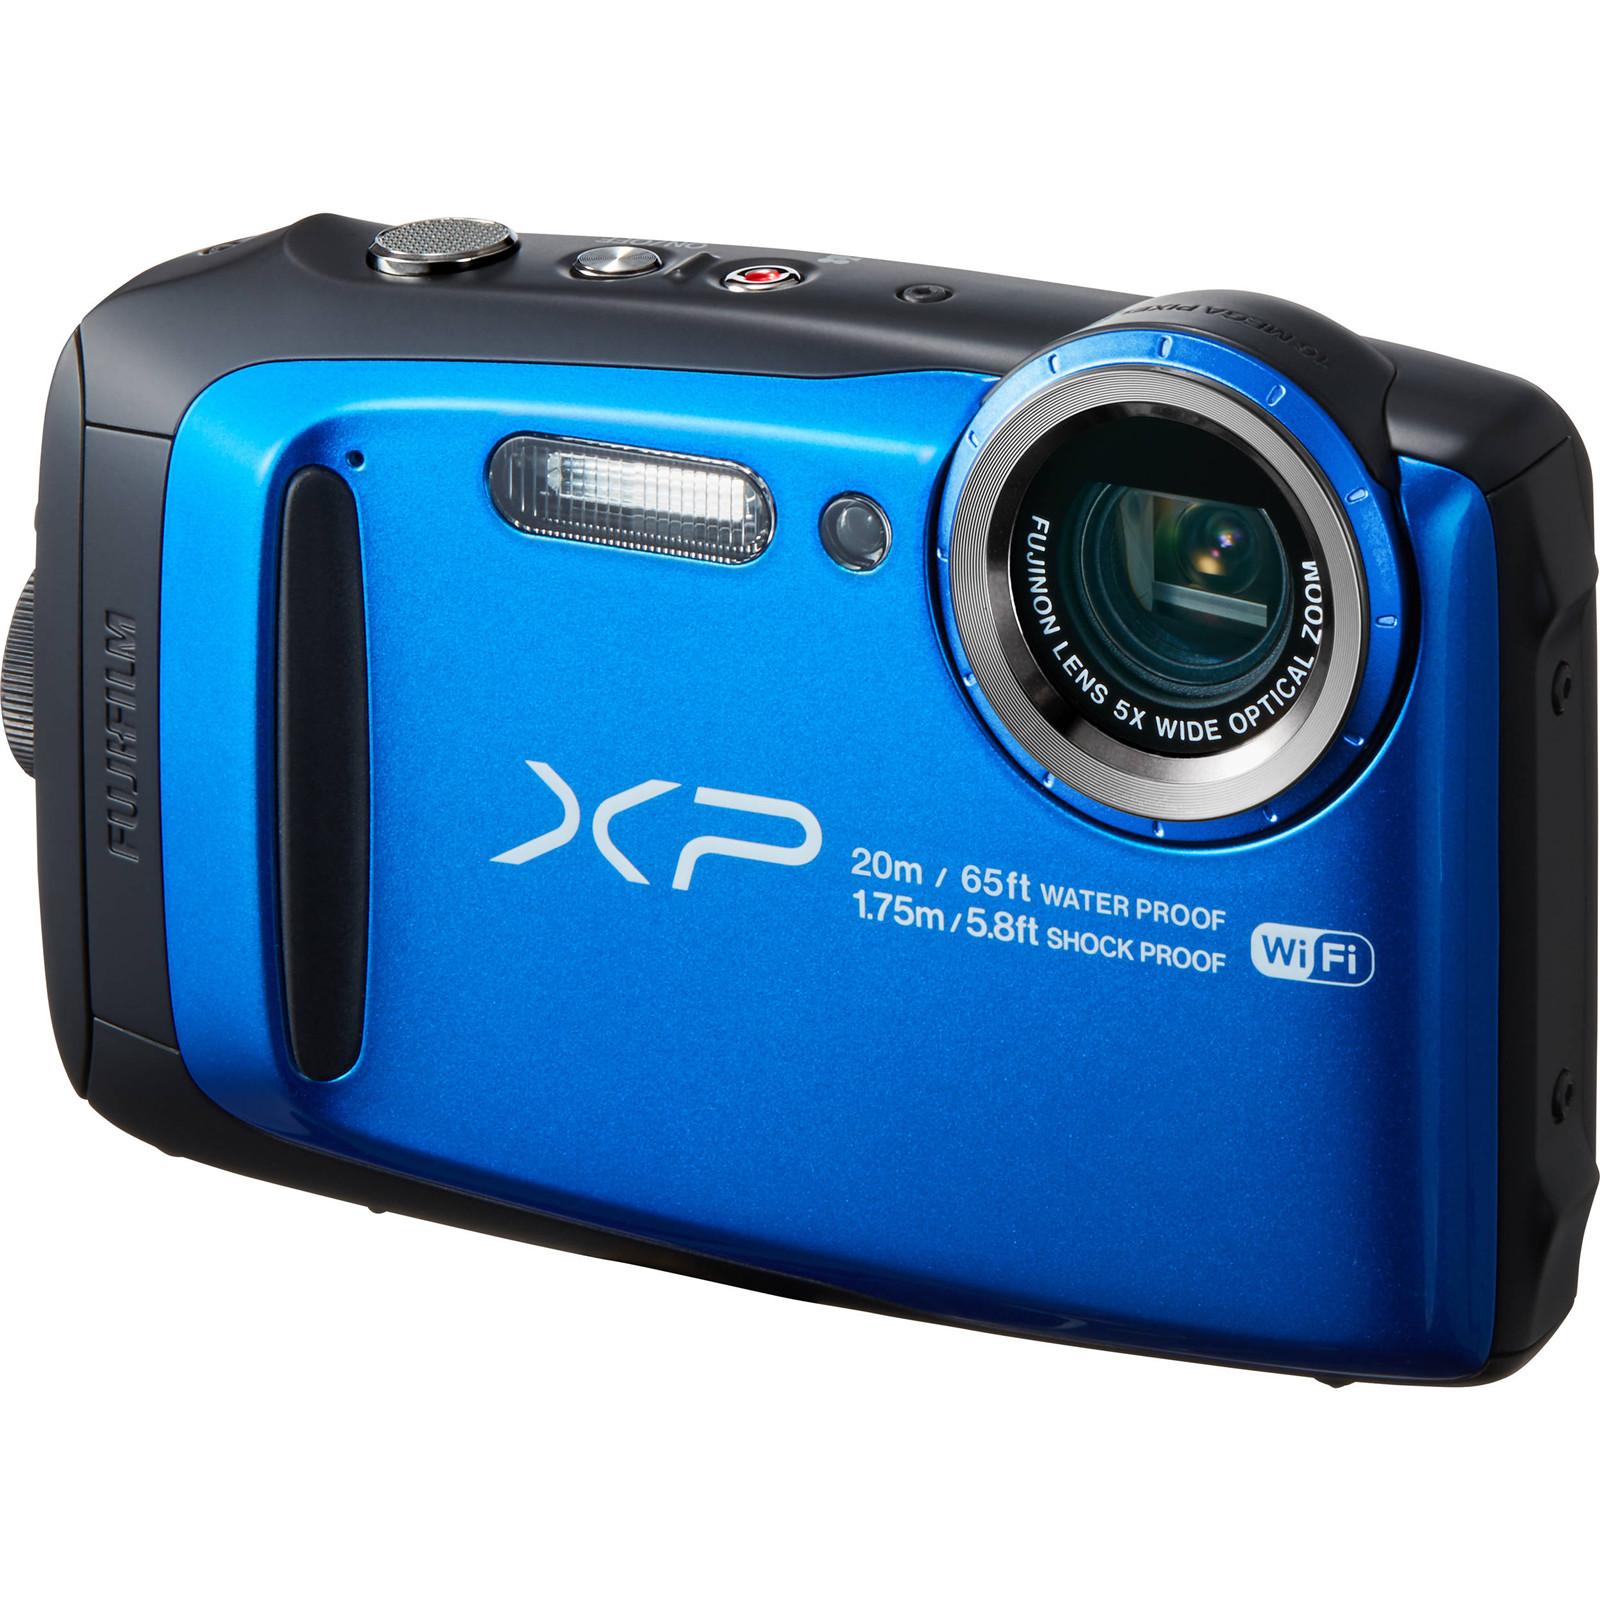 FujiFilm FinePix XP120 Digital Camera 164MP BSI CMOS Sensor Fujinon 5x Optical Zoom Lens Water Shock Freeze And Dustproof Blue